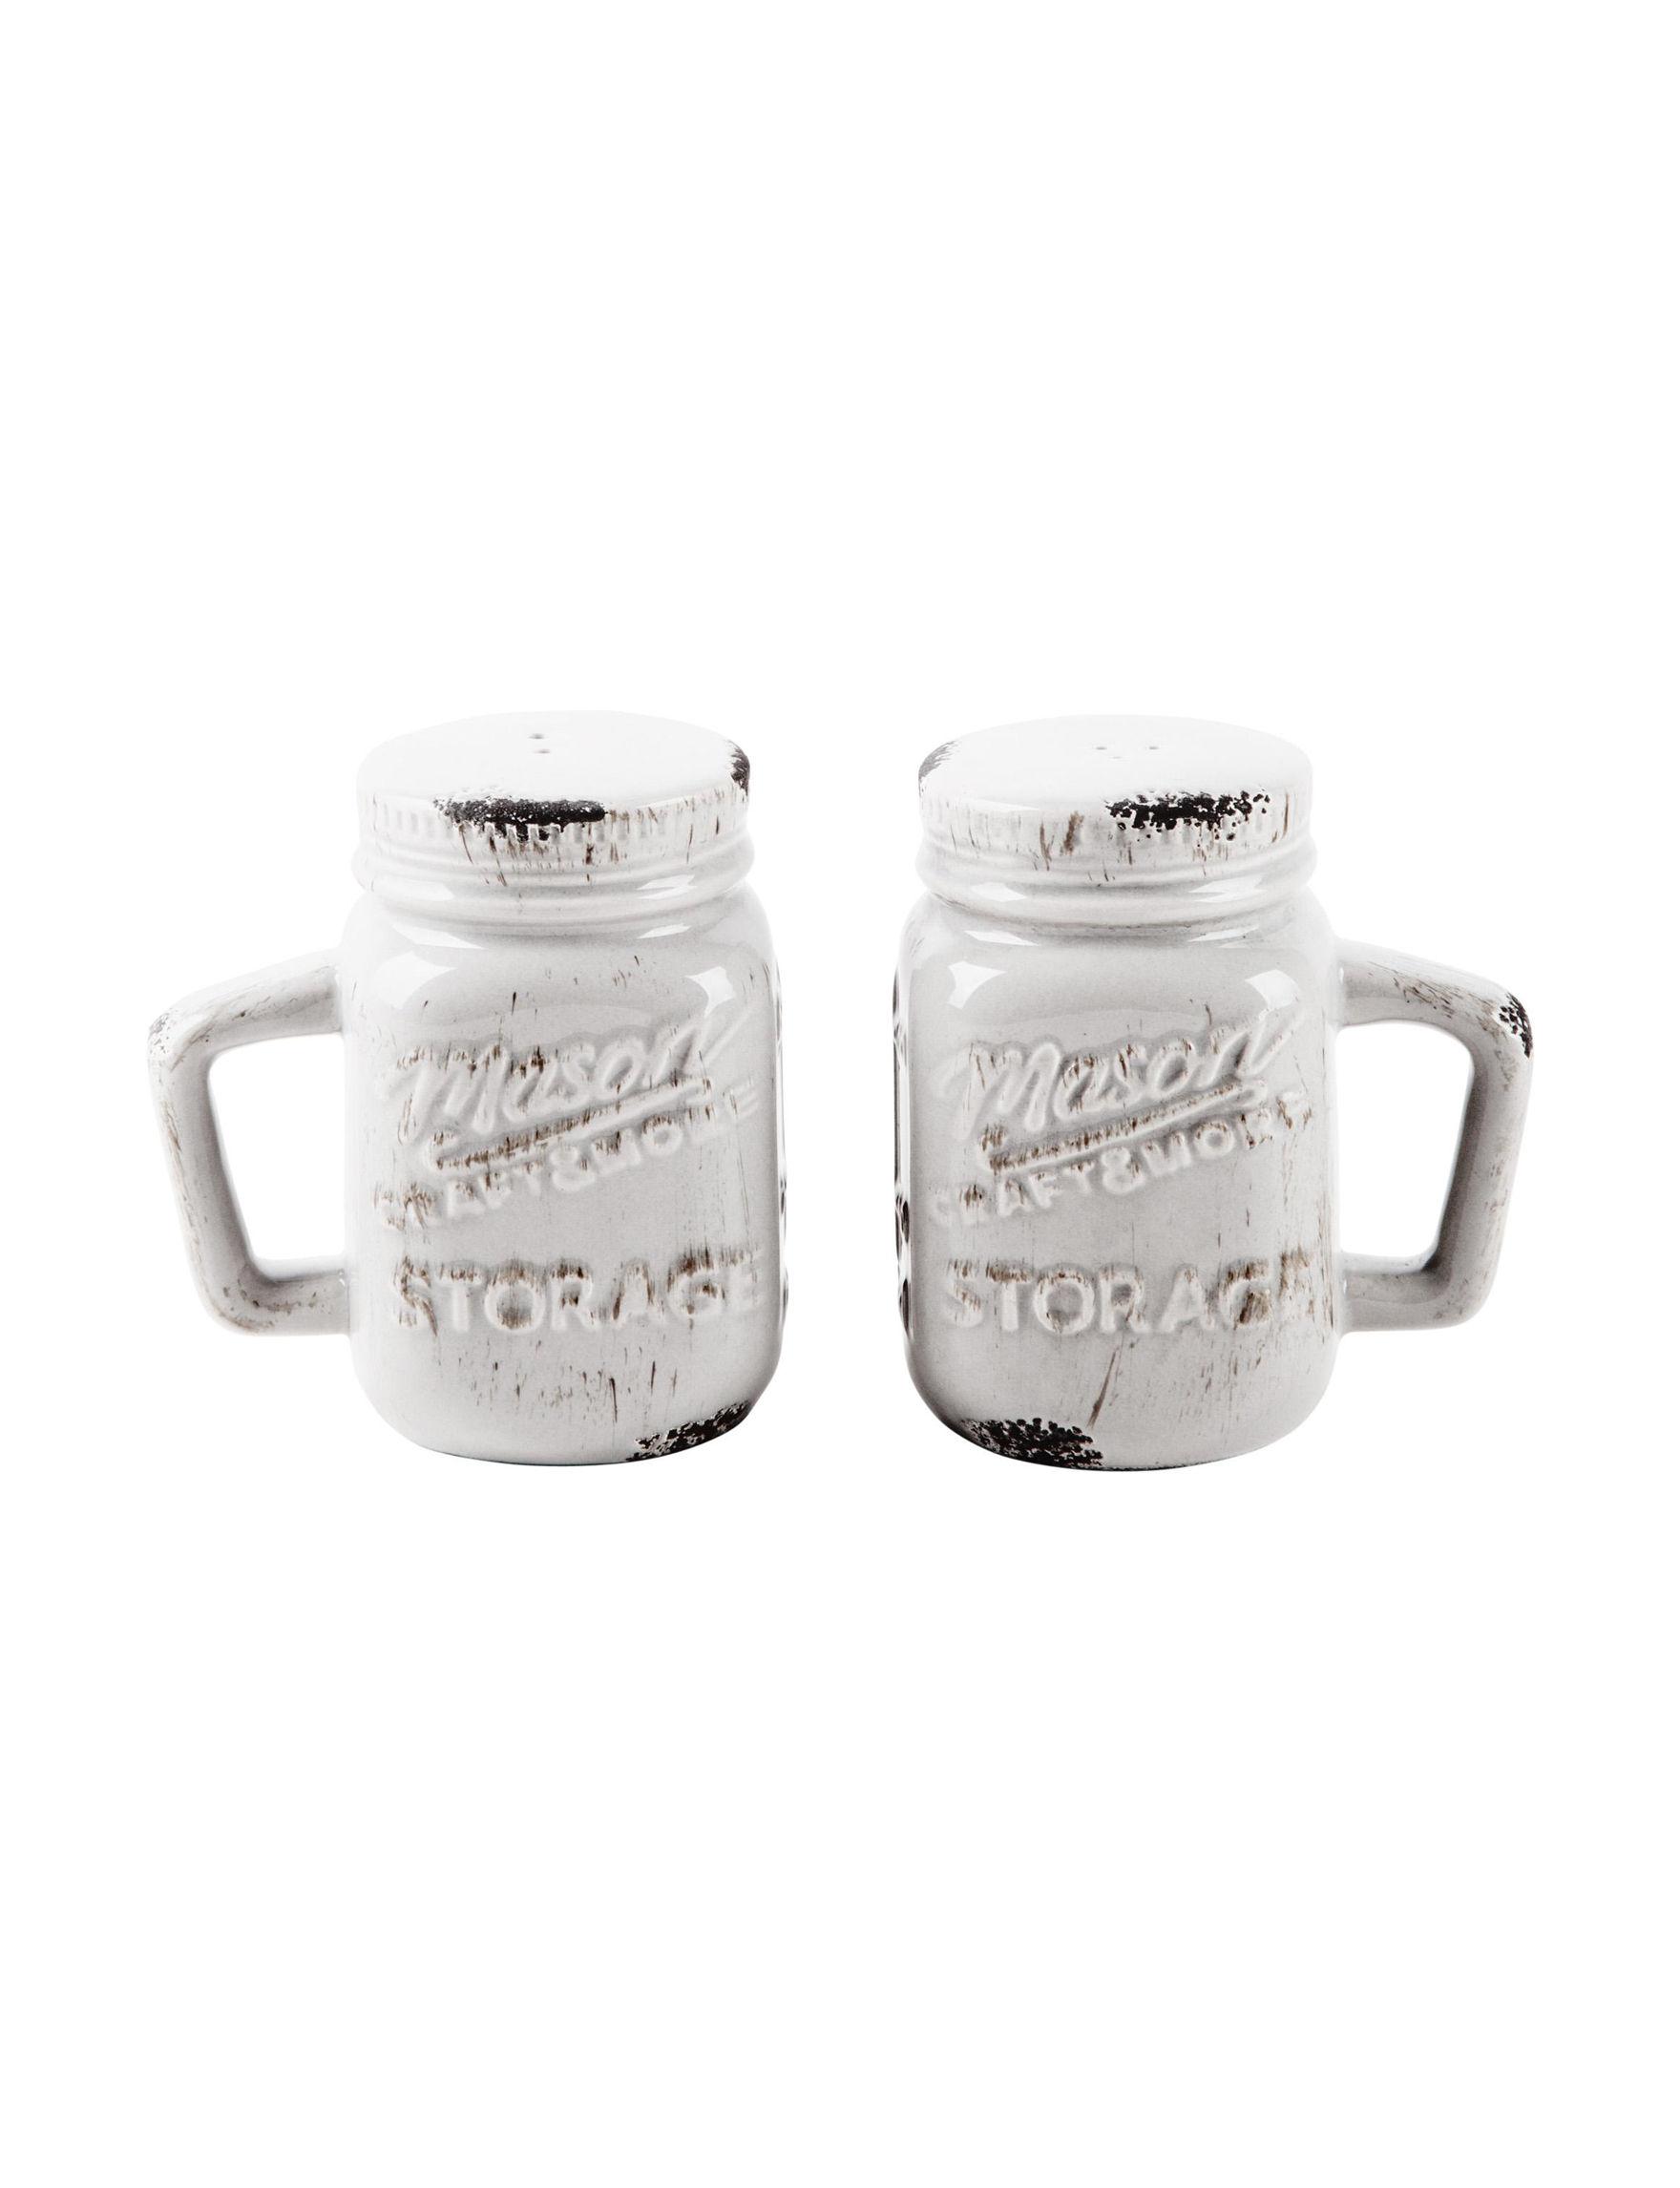 Home Essentials White Salt & Pepper Shakers Serveware